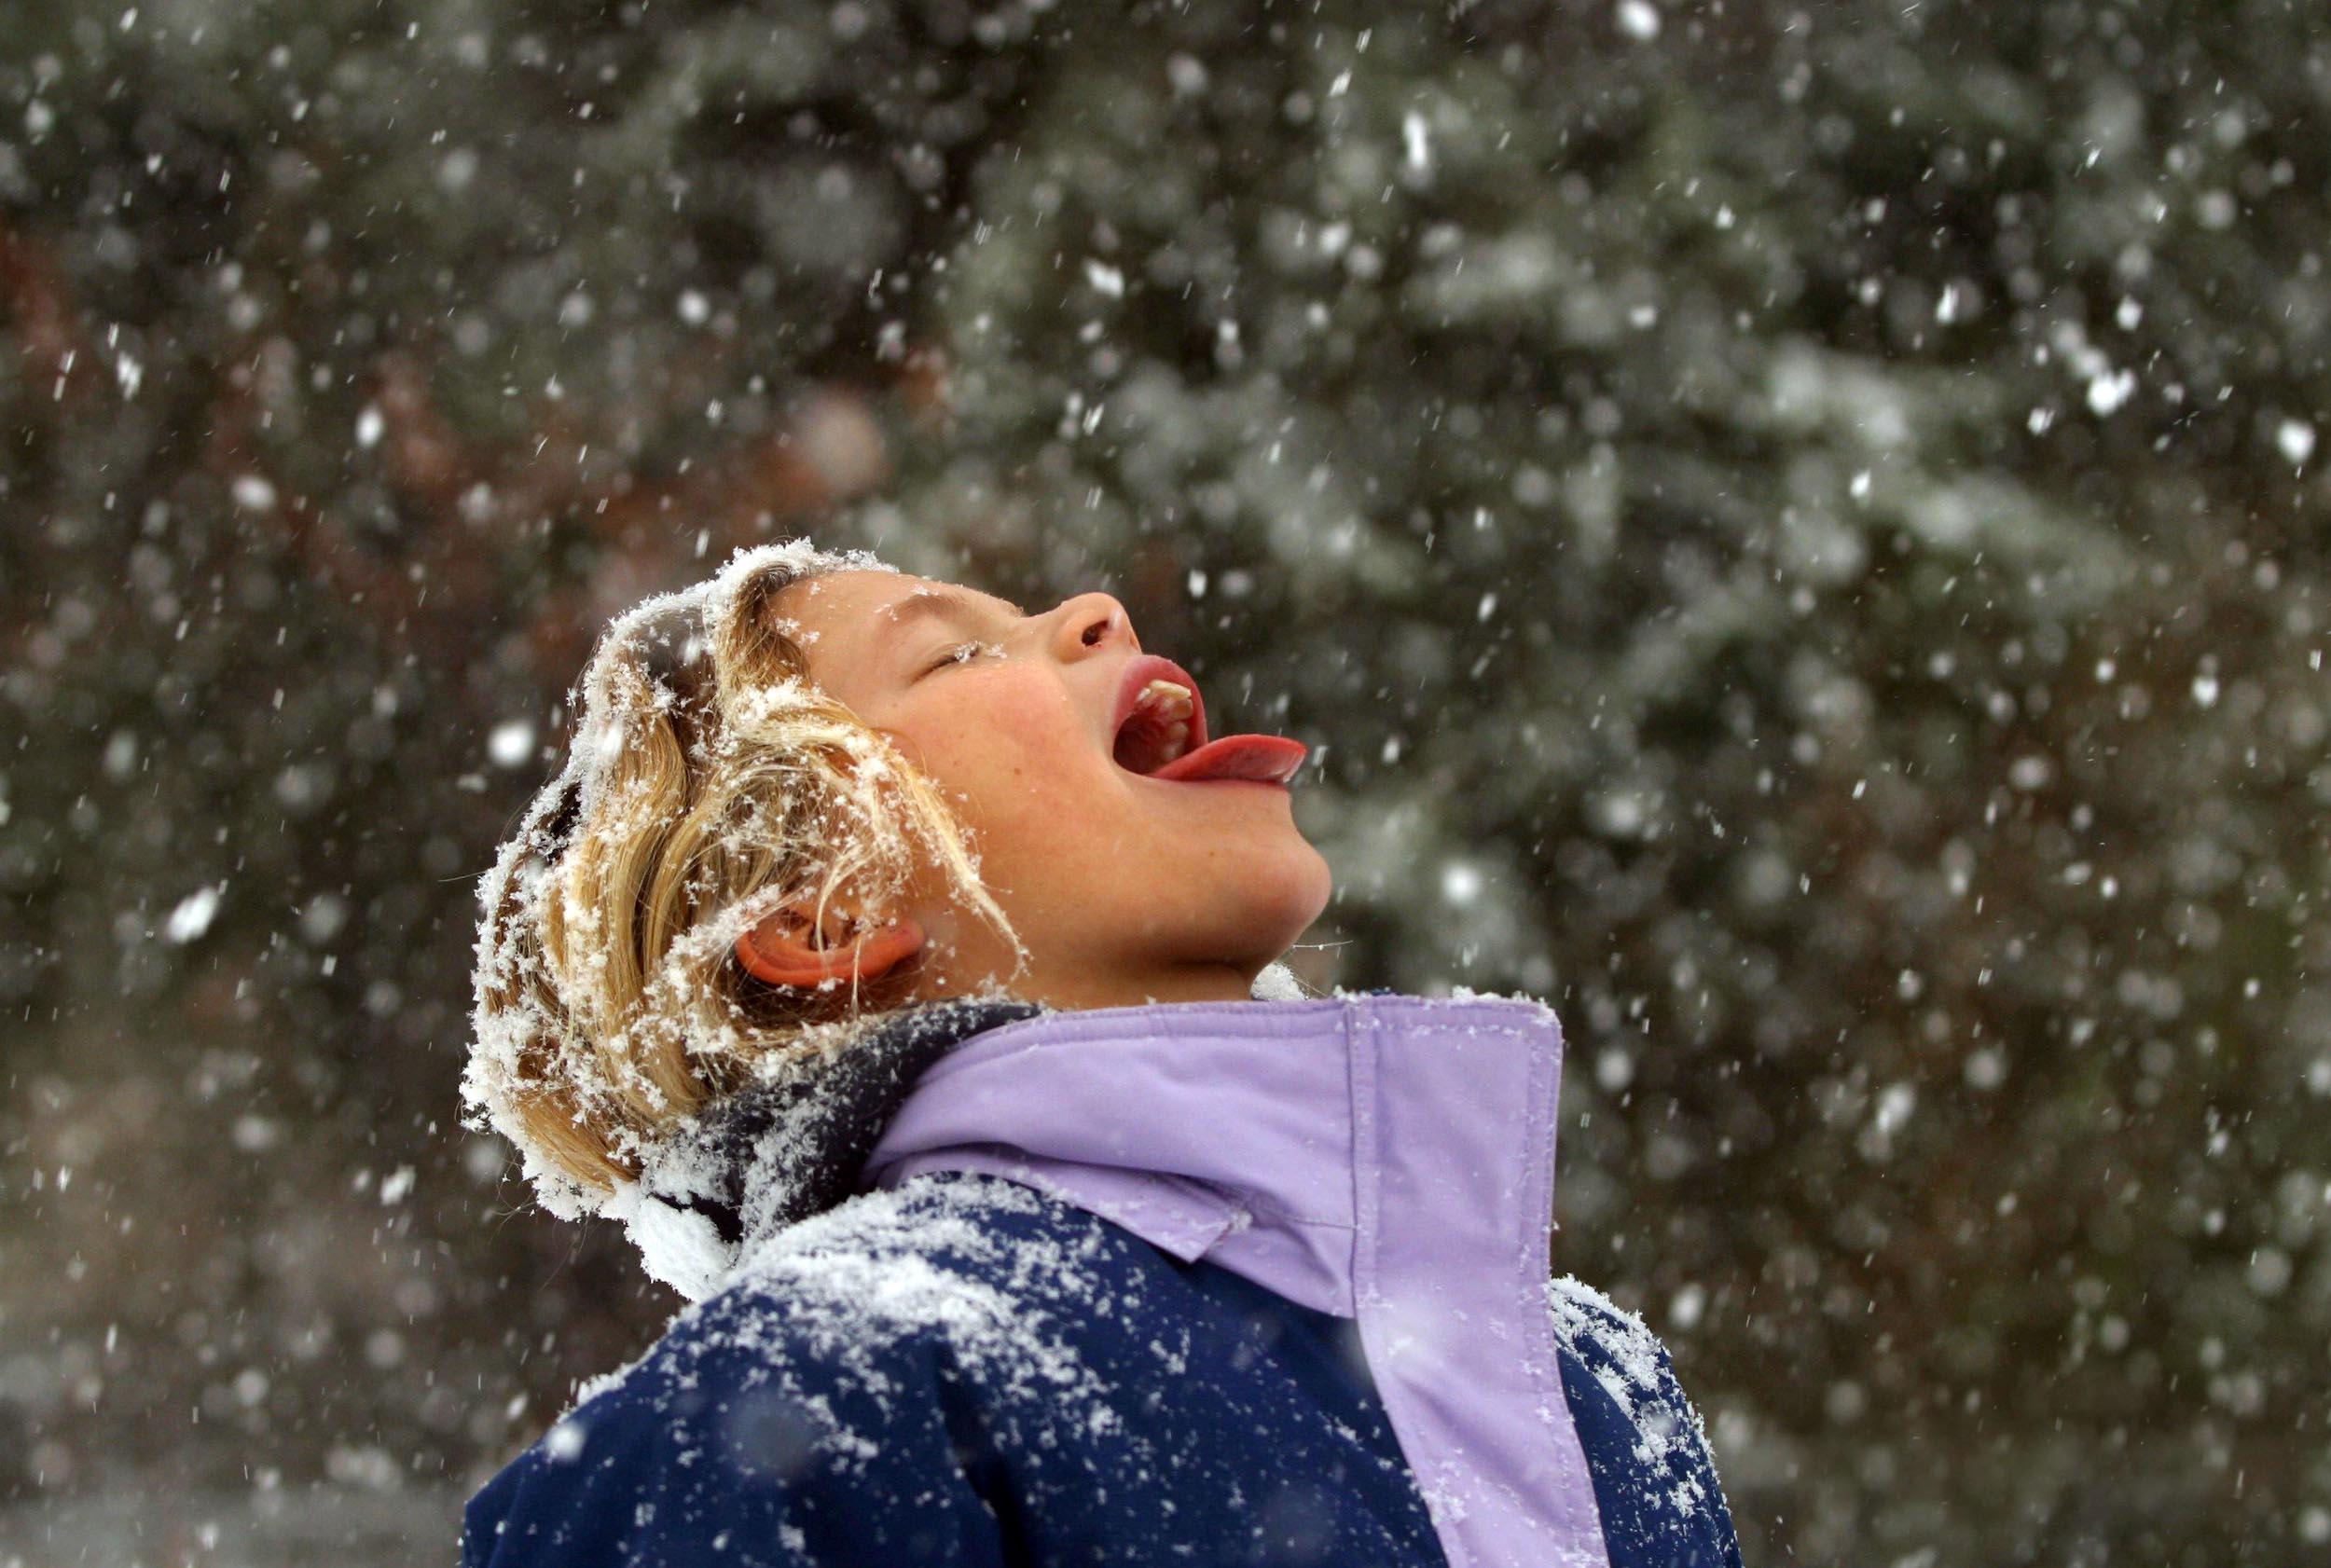 Snow Day—School's Out - 2003, © Ellen Banner